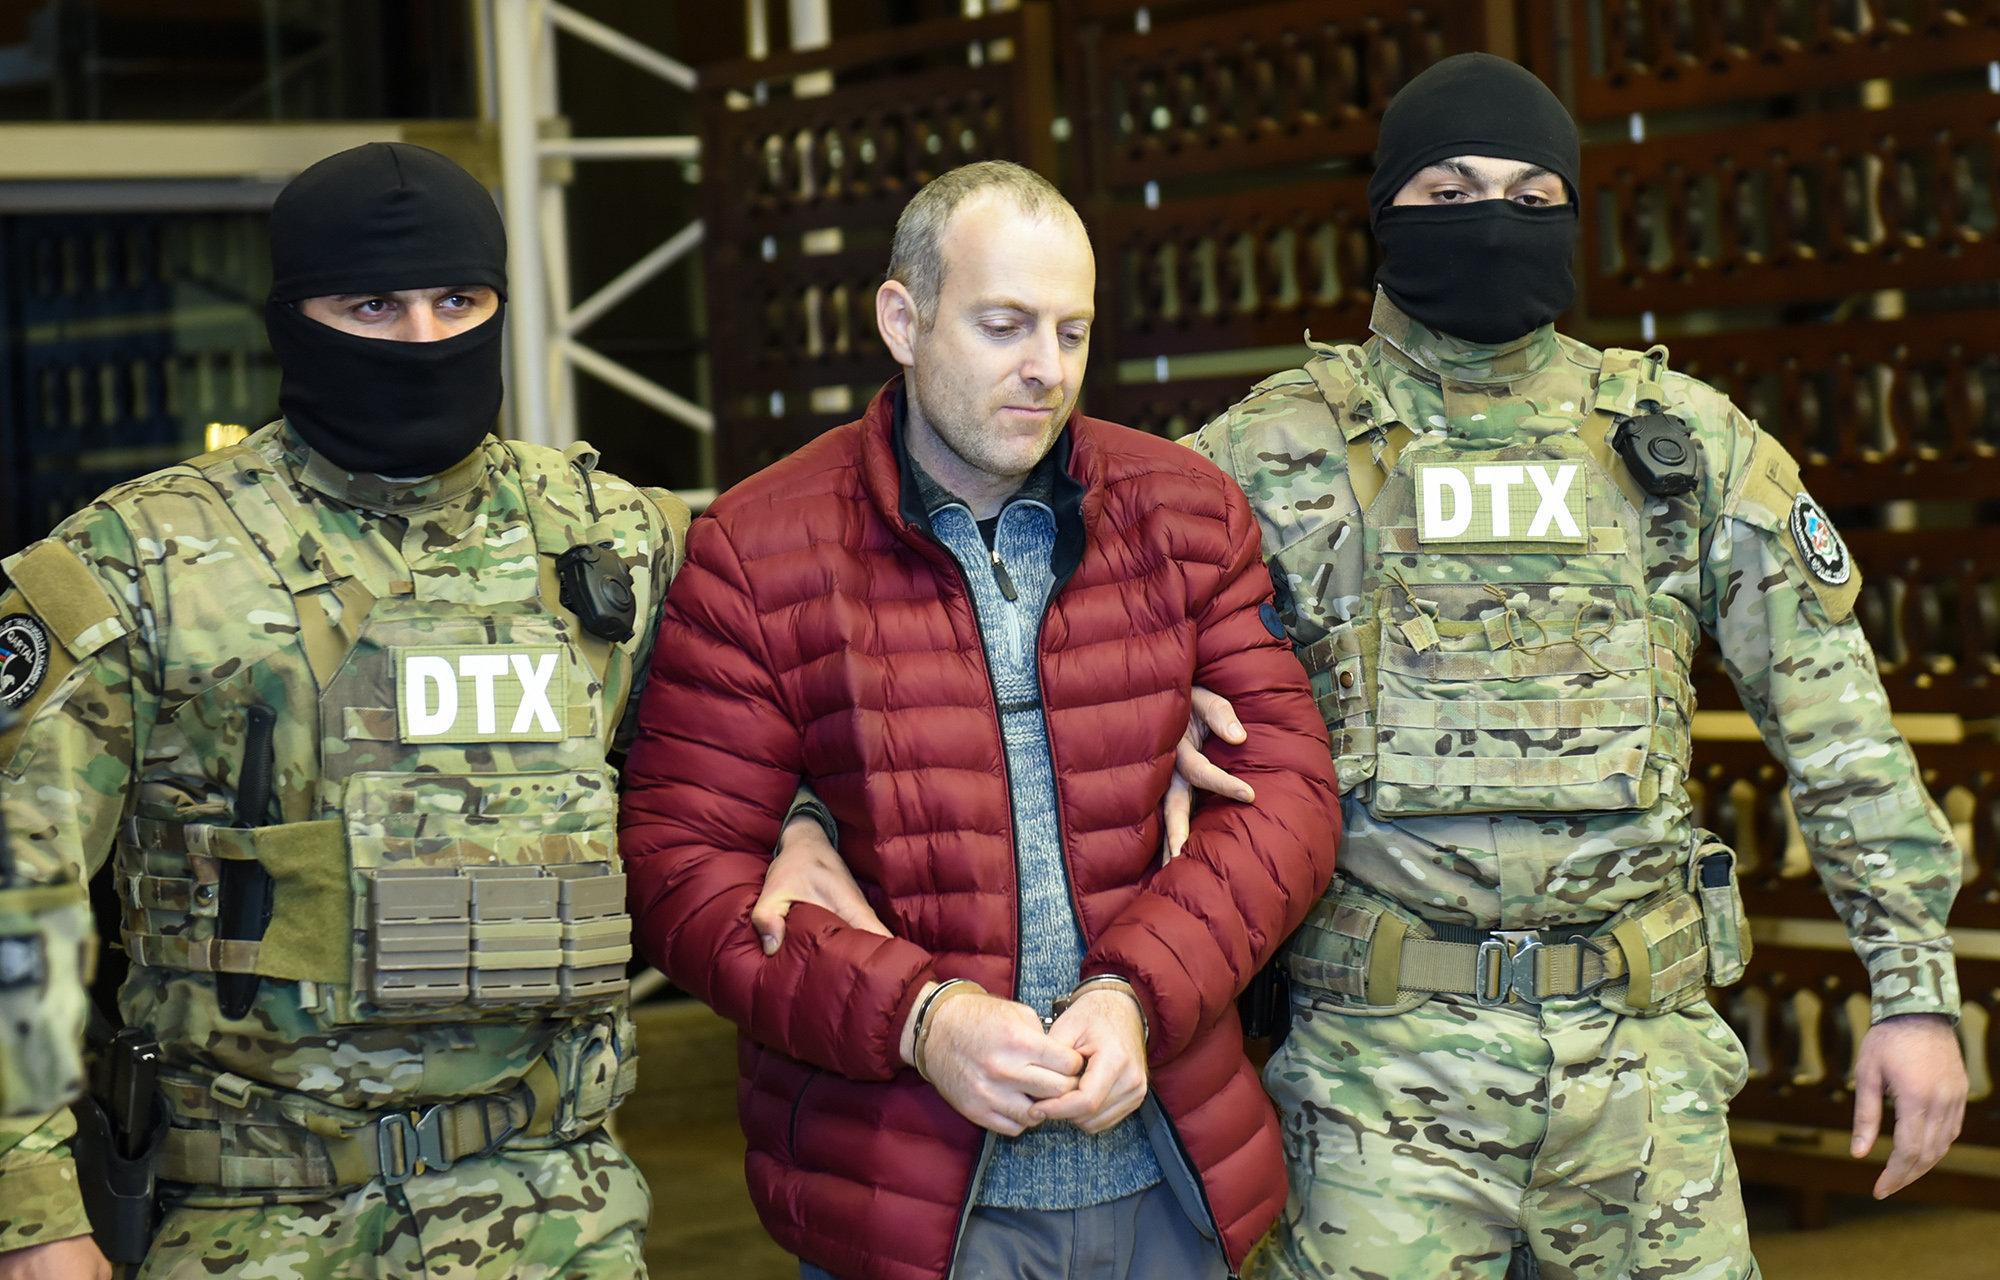 408788657 #новости Азербайджан, Лапшин, приговор, срок, суд